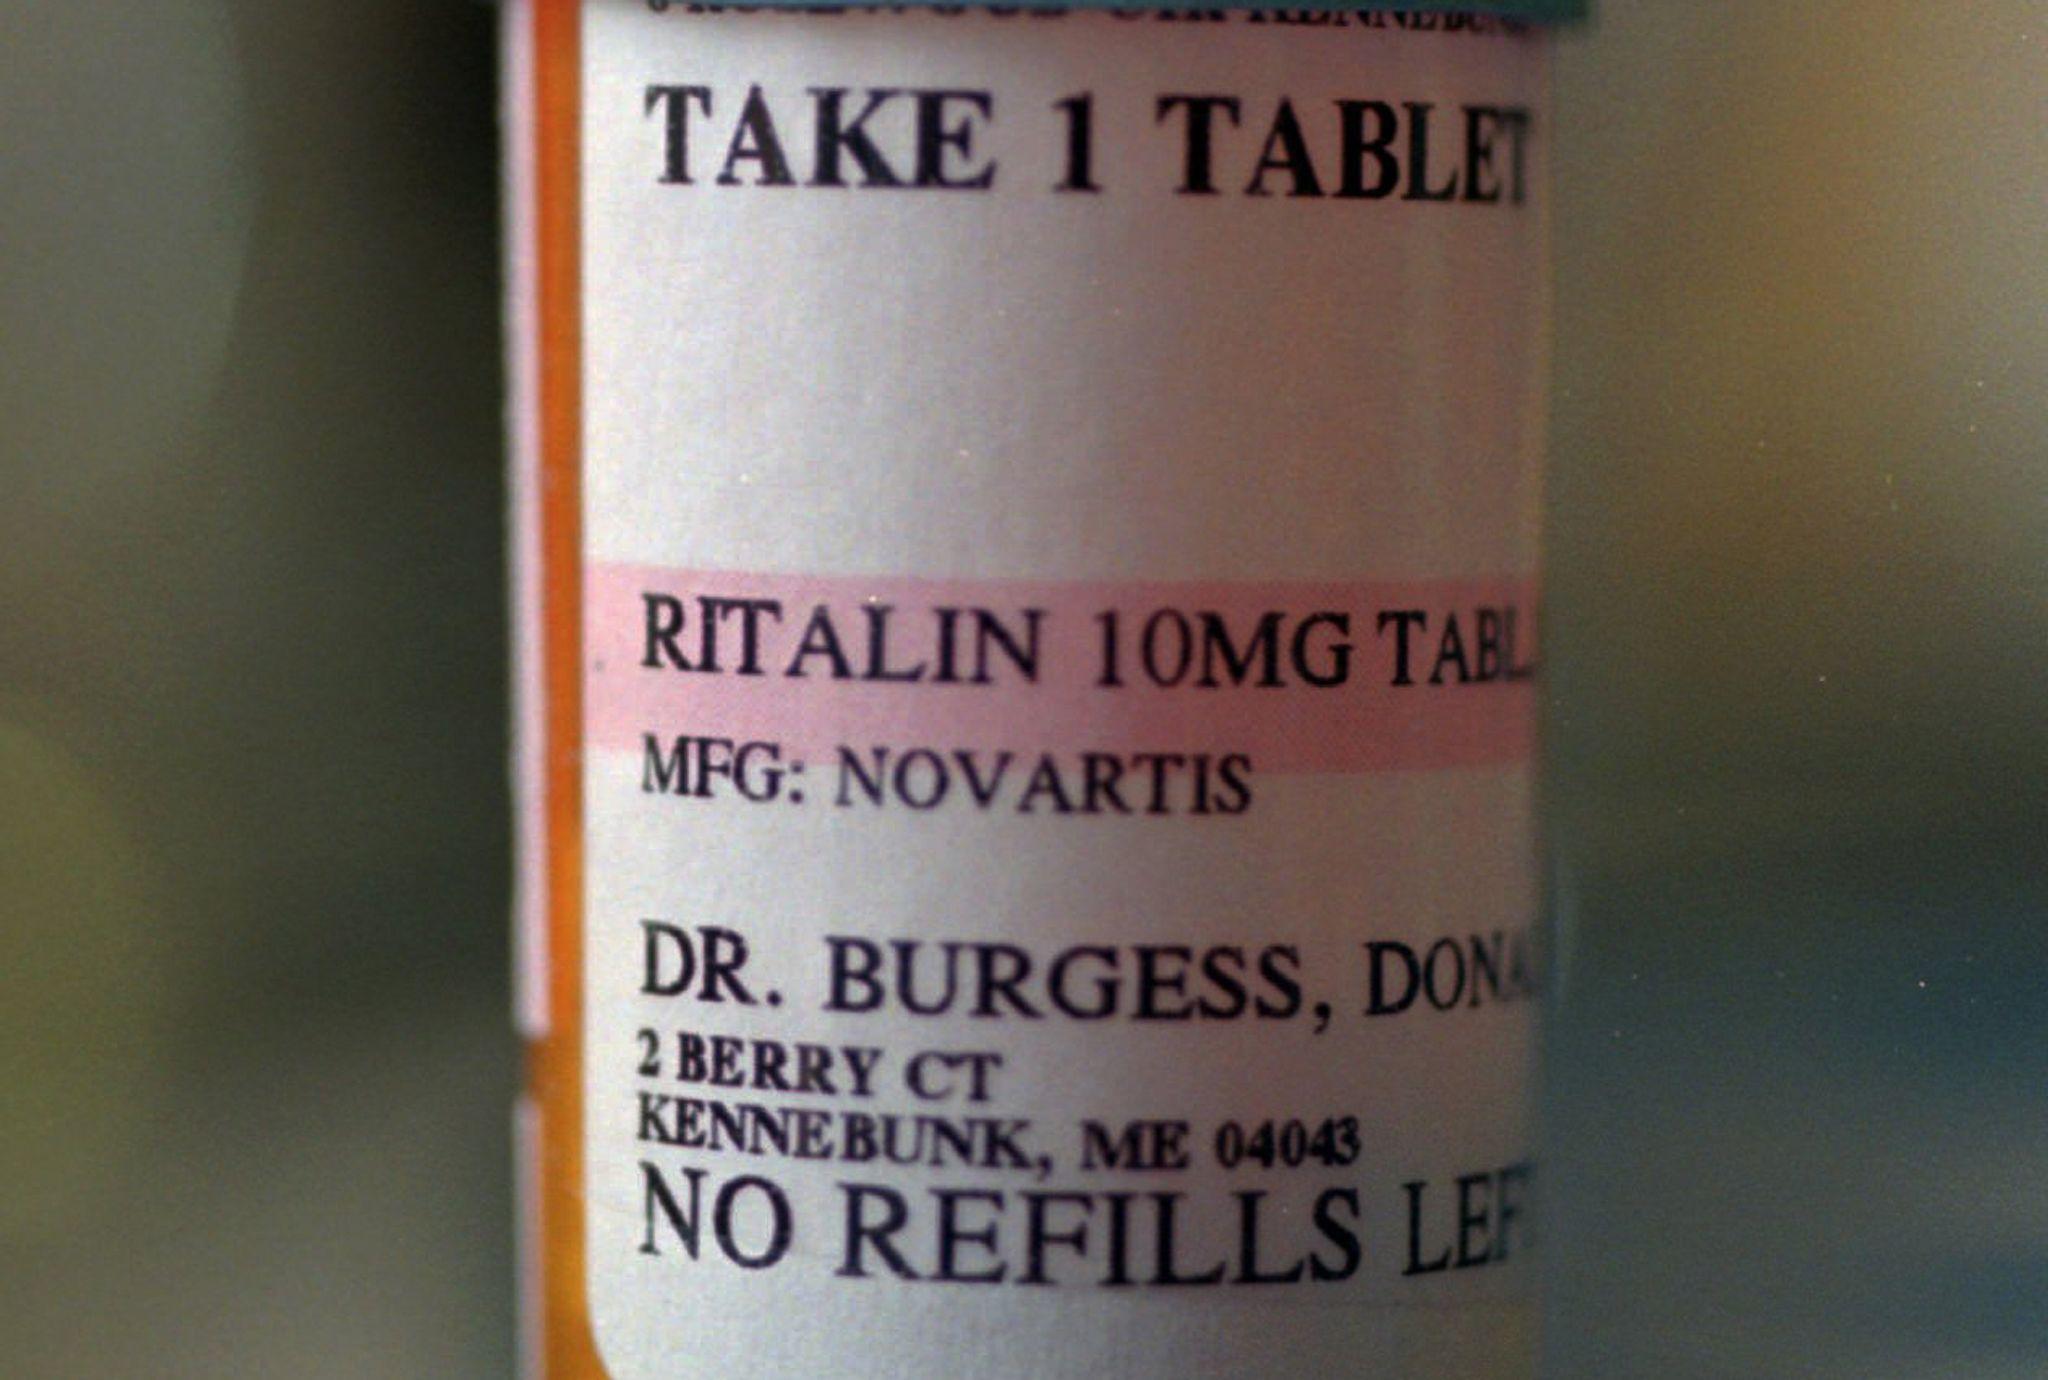 16 Million Us Adults On Prescription Stimulants Study